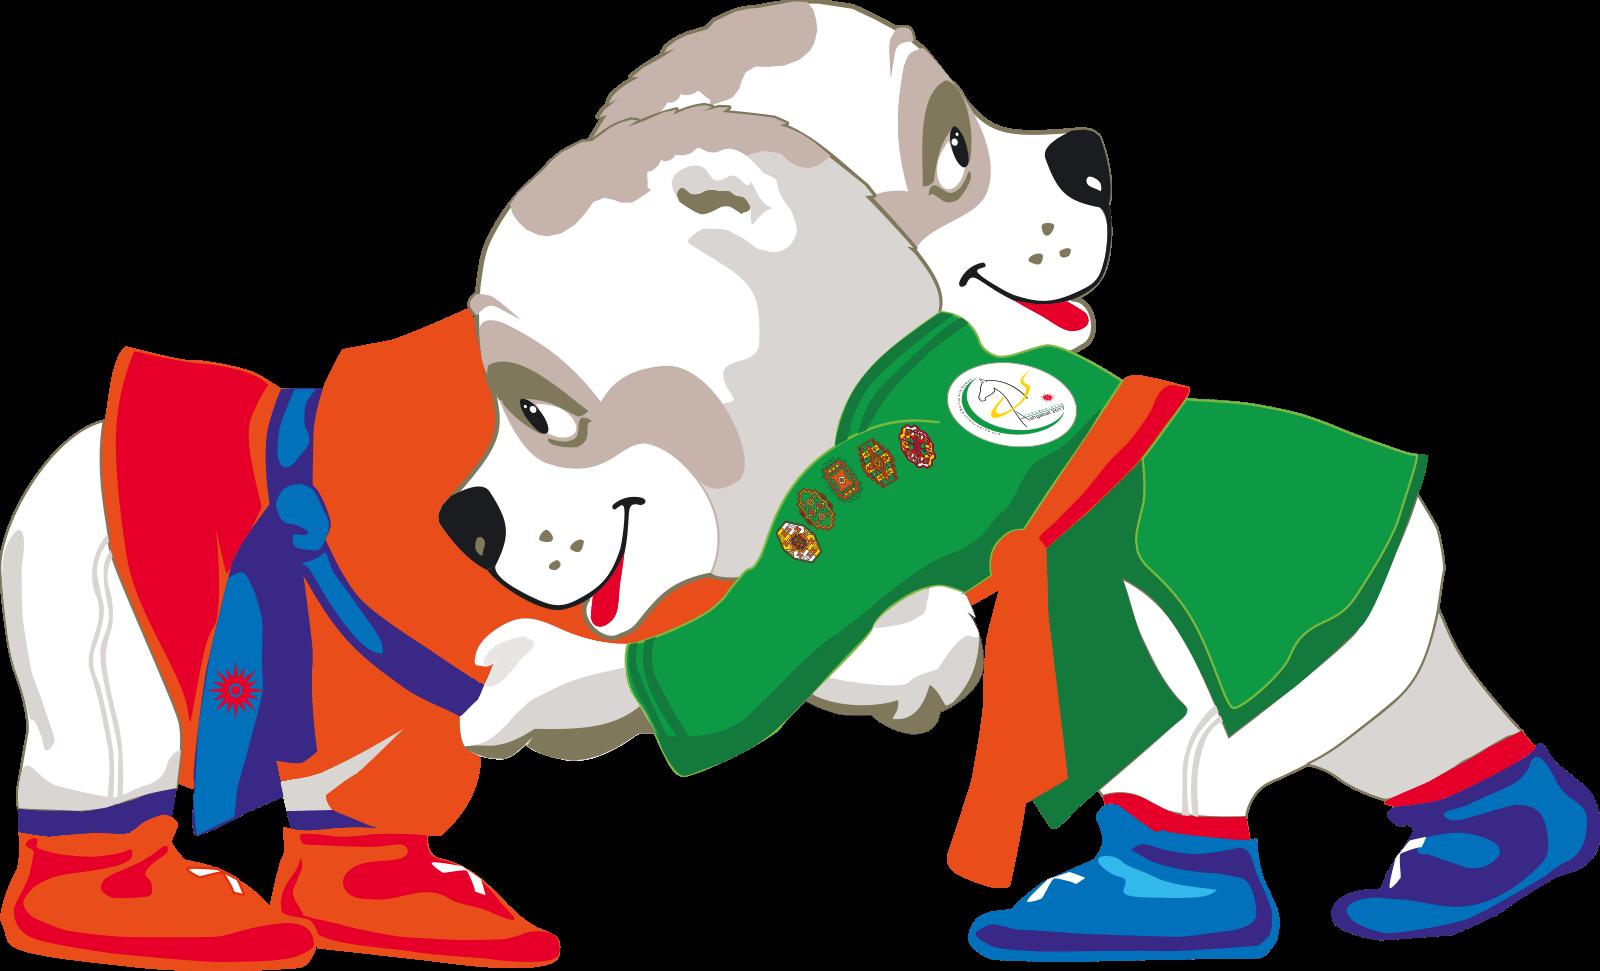 Wrestlers clipart mascot. The games ashgabat belt